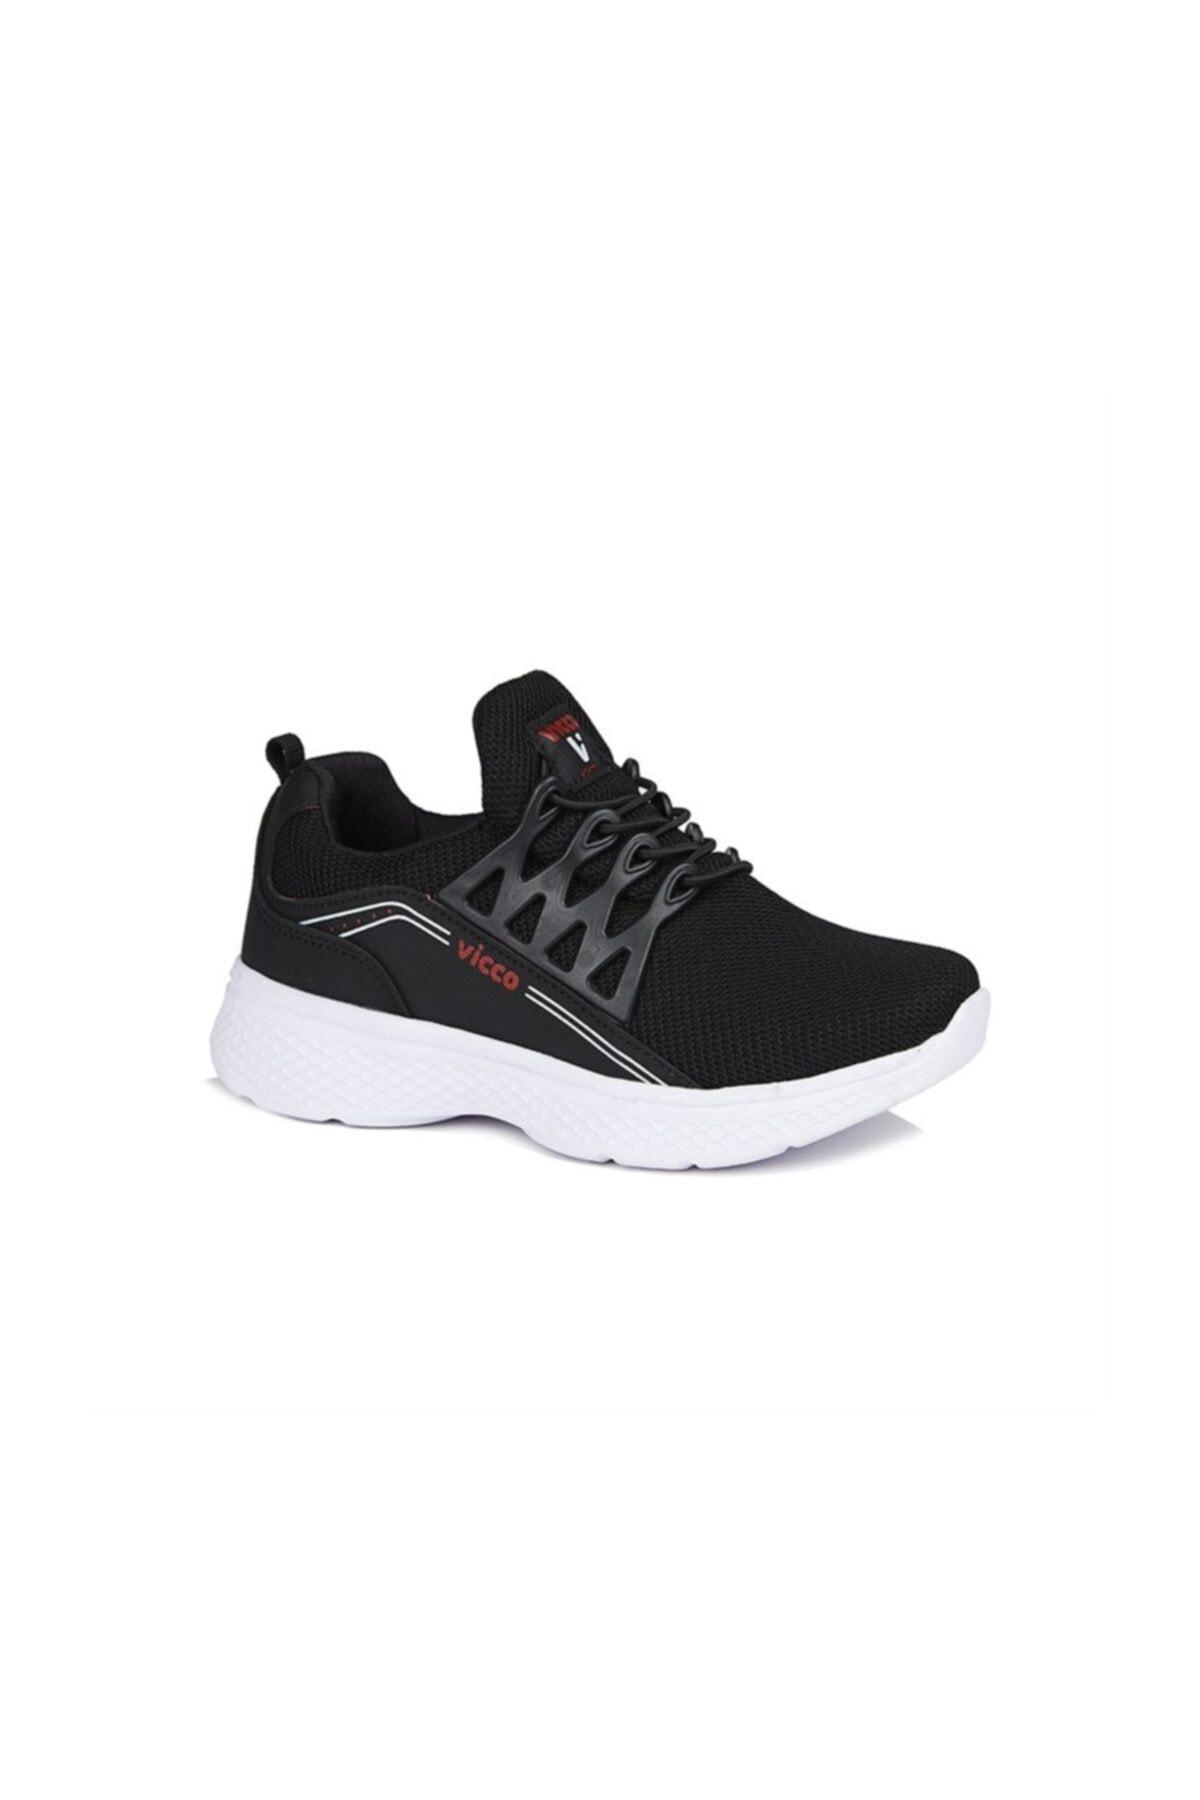 Vicco Spider Spor Ayakkabı Siyah 2